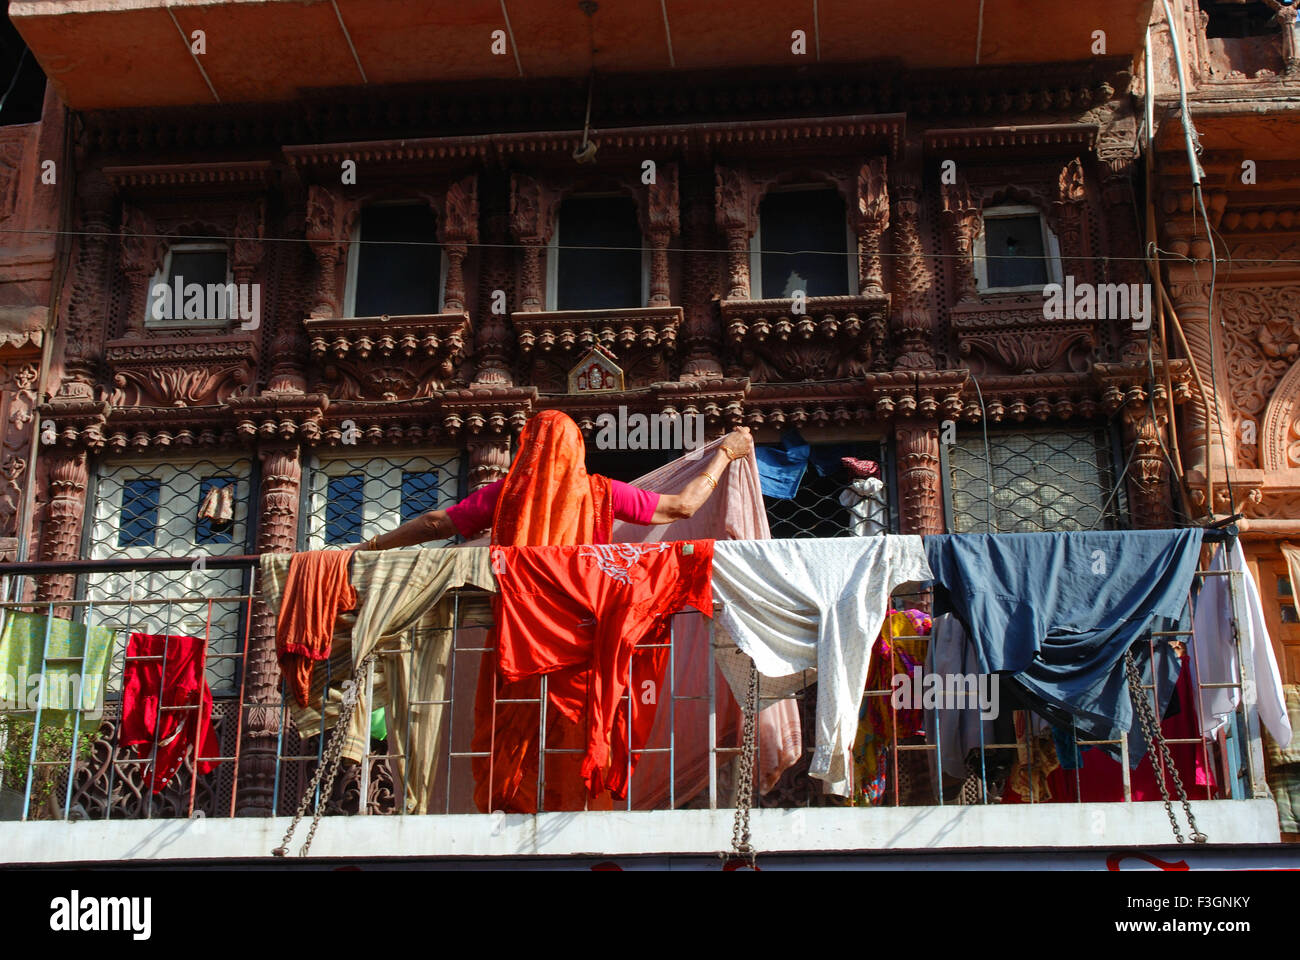 Woman drying cloths ; Jodhpur ; Rajasthan ; India - Stock Image